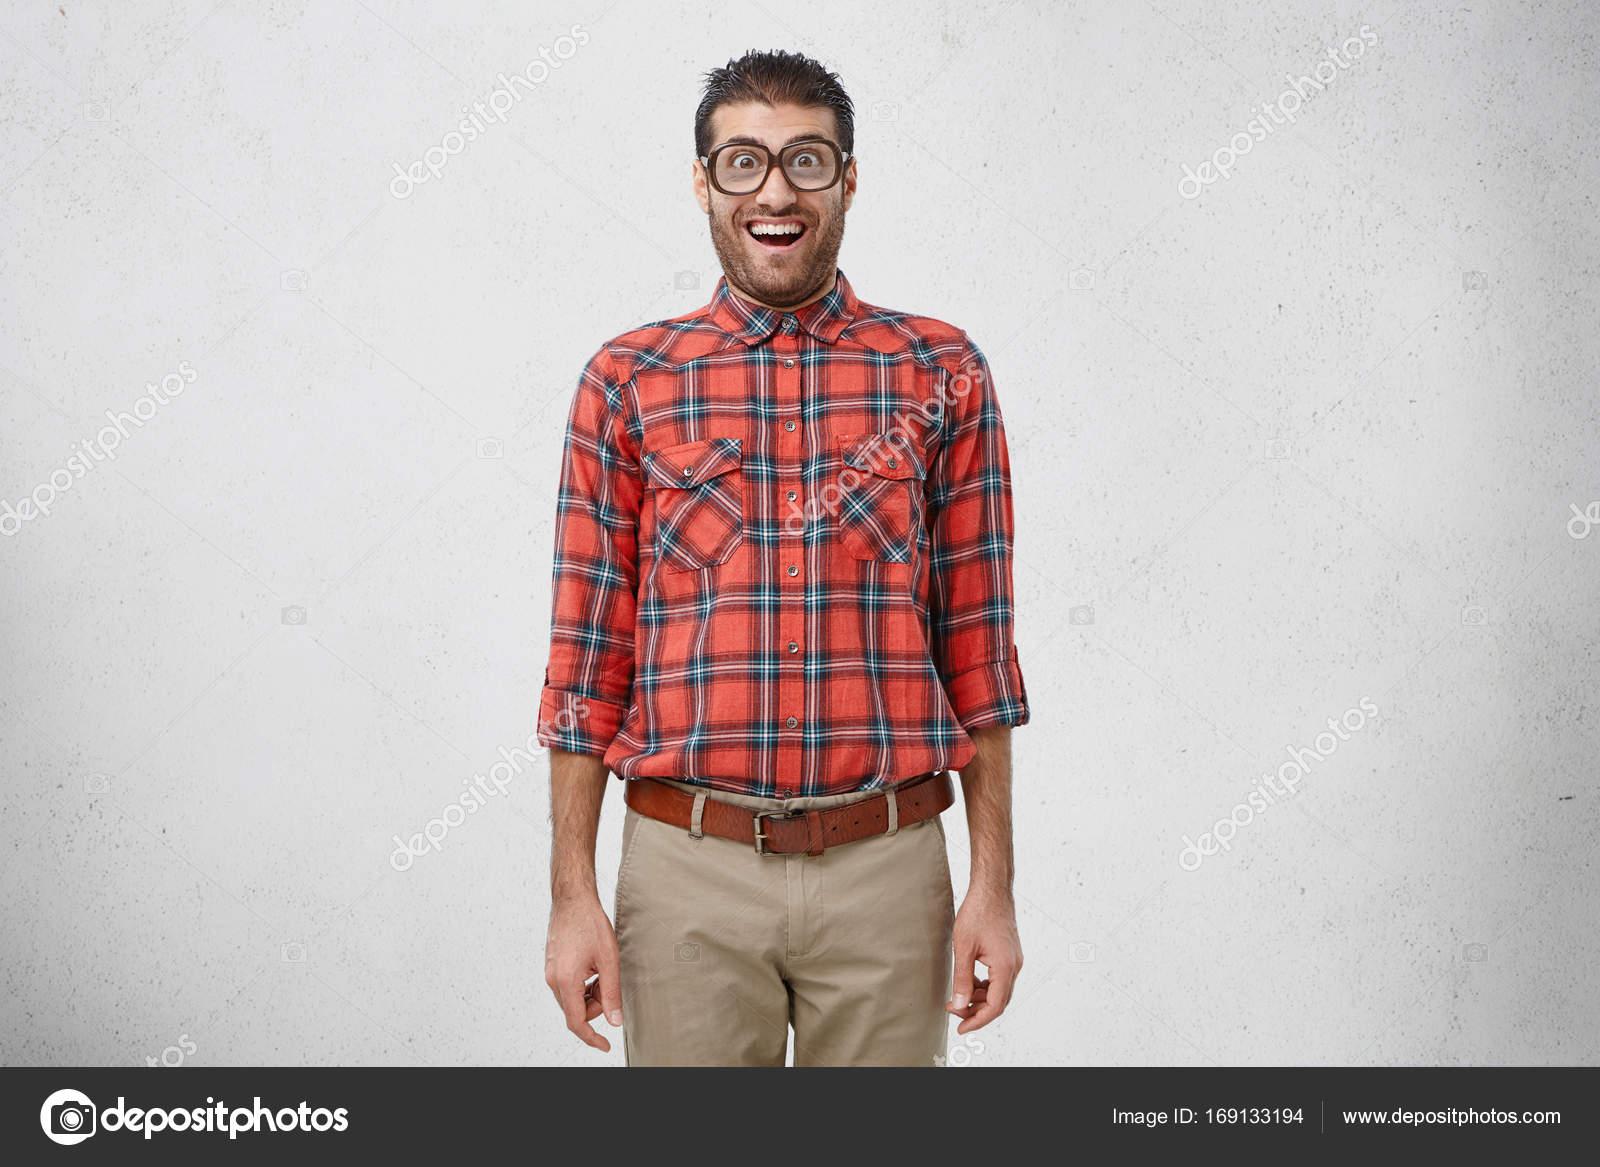 96aff19ae5 αρσενικό nerd φοράει παλιάς μόδας γυαλιά — Φωτογραφία Αρχείου ...